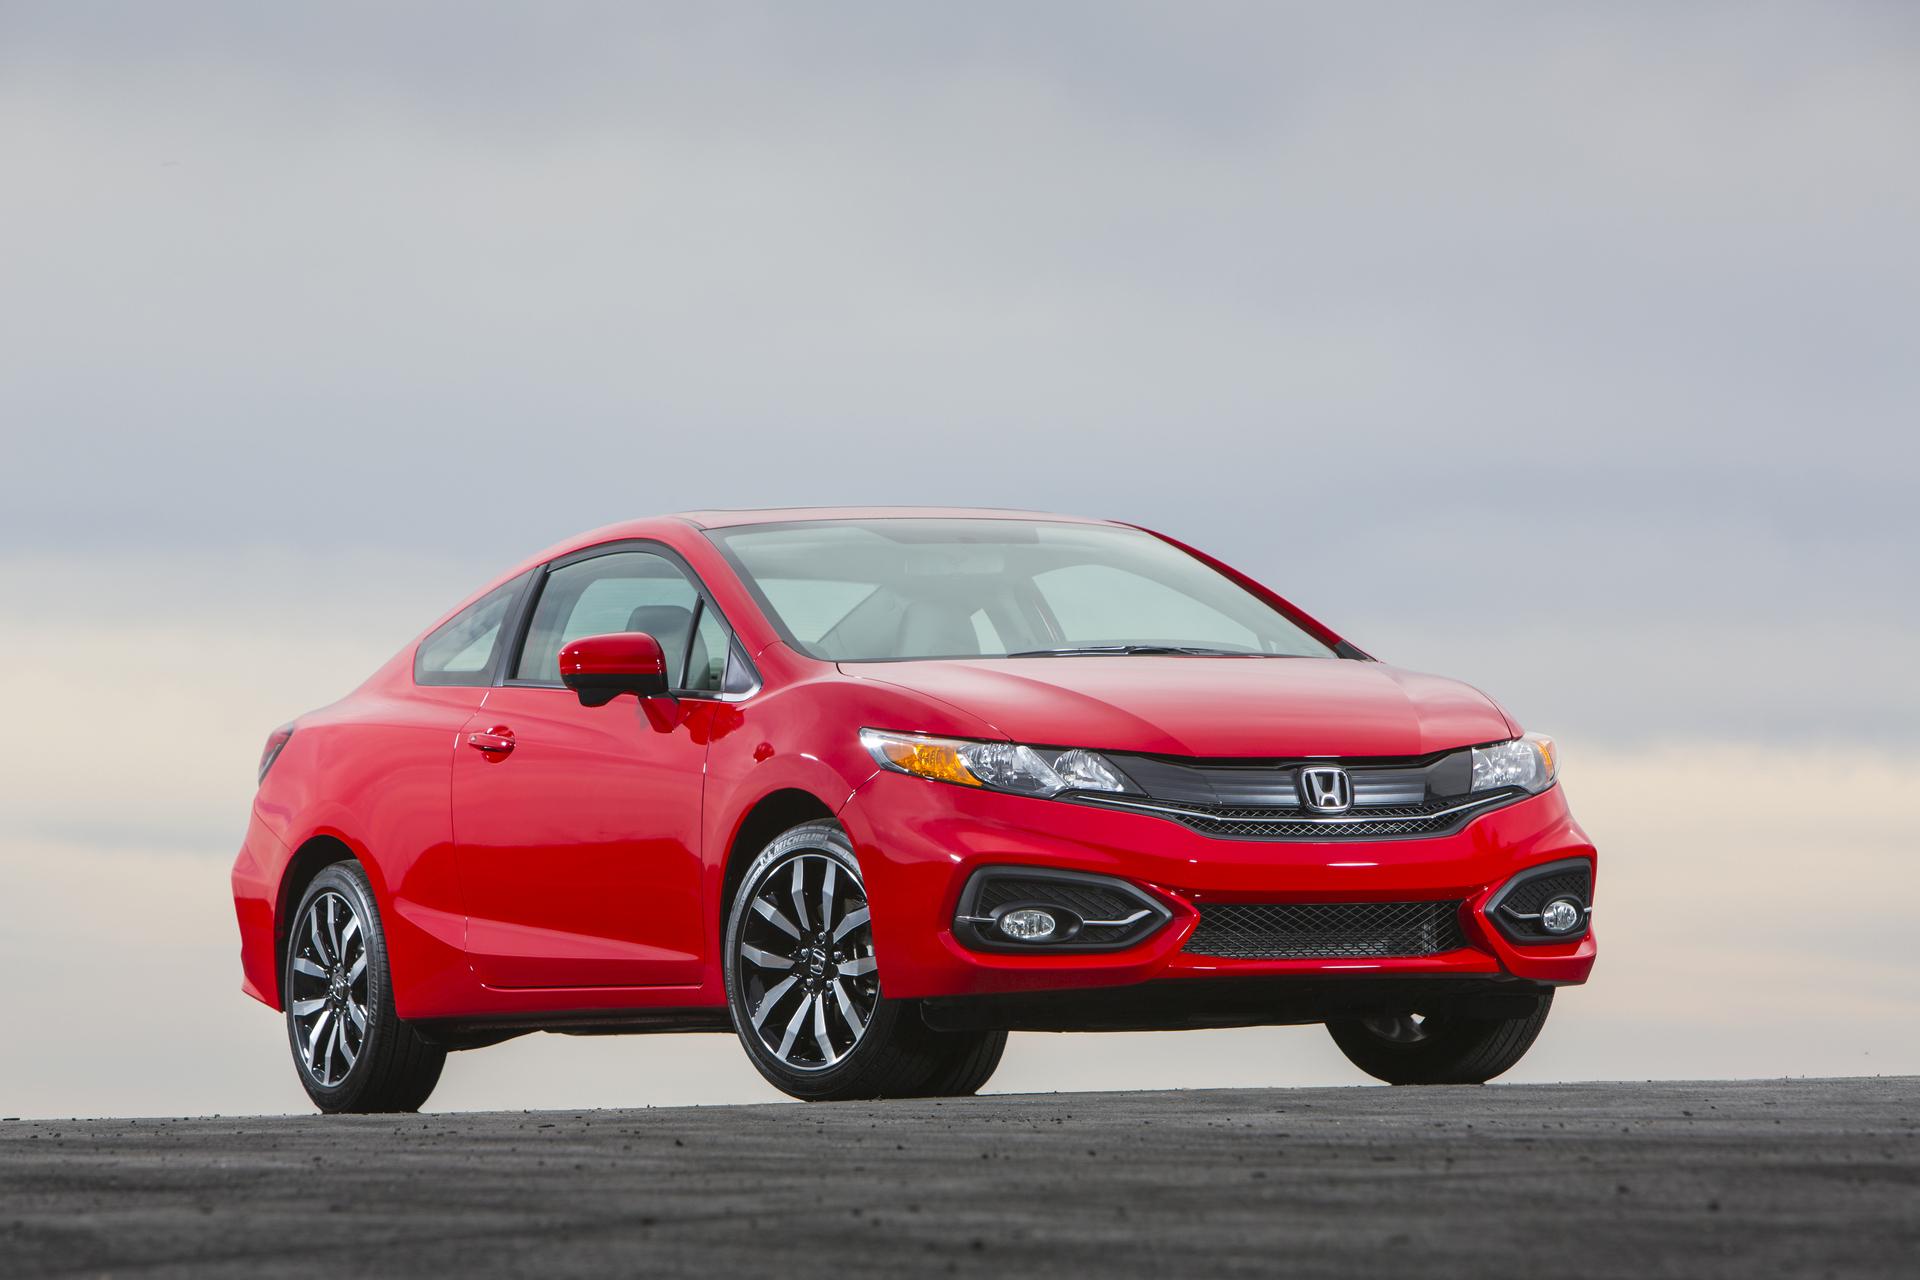 2015 Honda Civic Coupe © Honda Motor Co., Ltd.